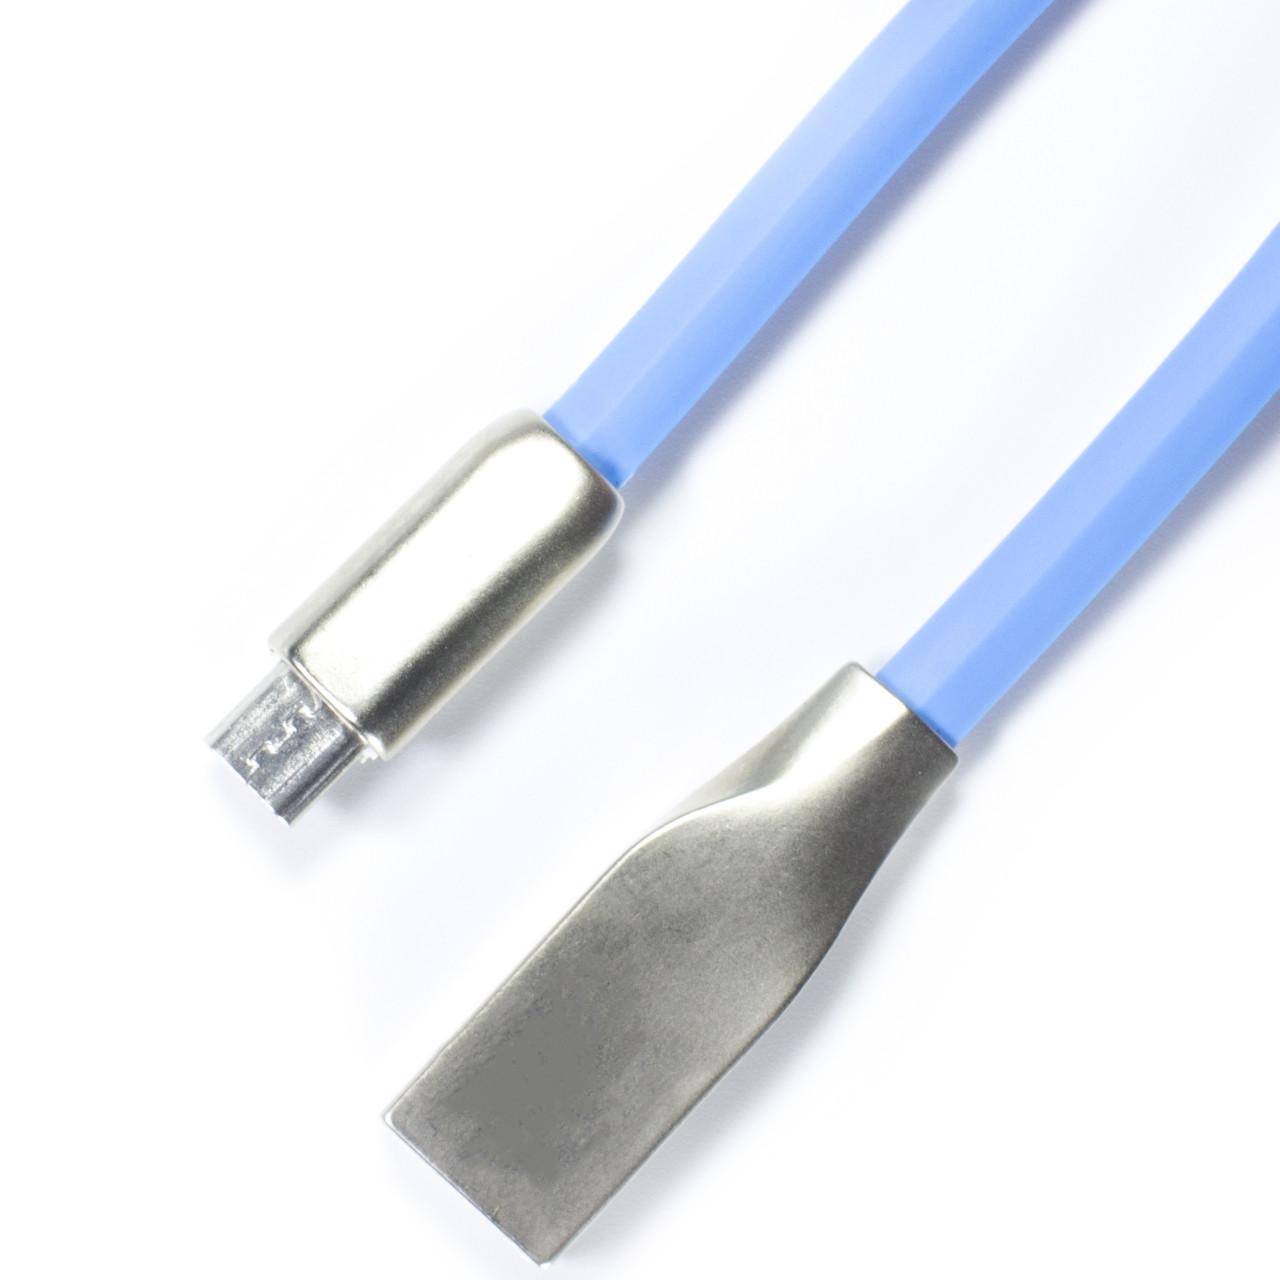 ⇒Кабель браслет Lesko USB 2.0 microUSB/USB Синий на руку к смартфону